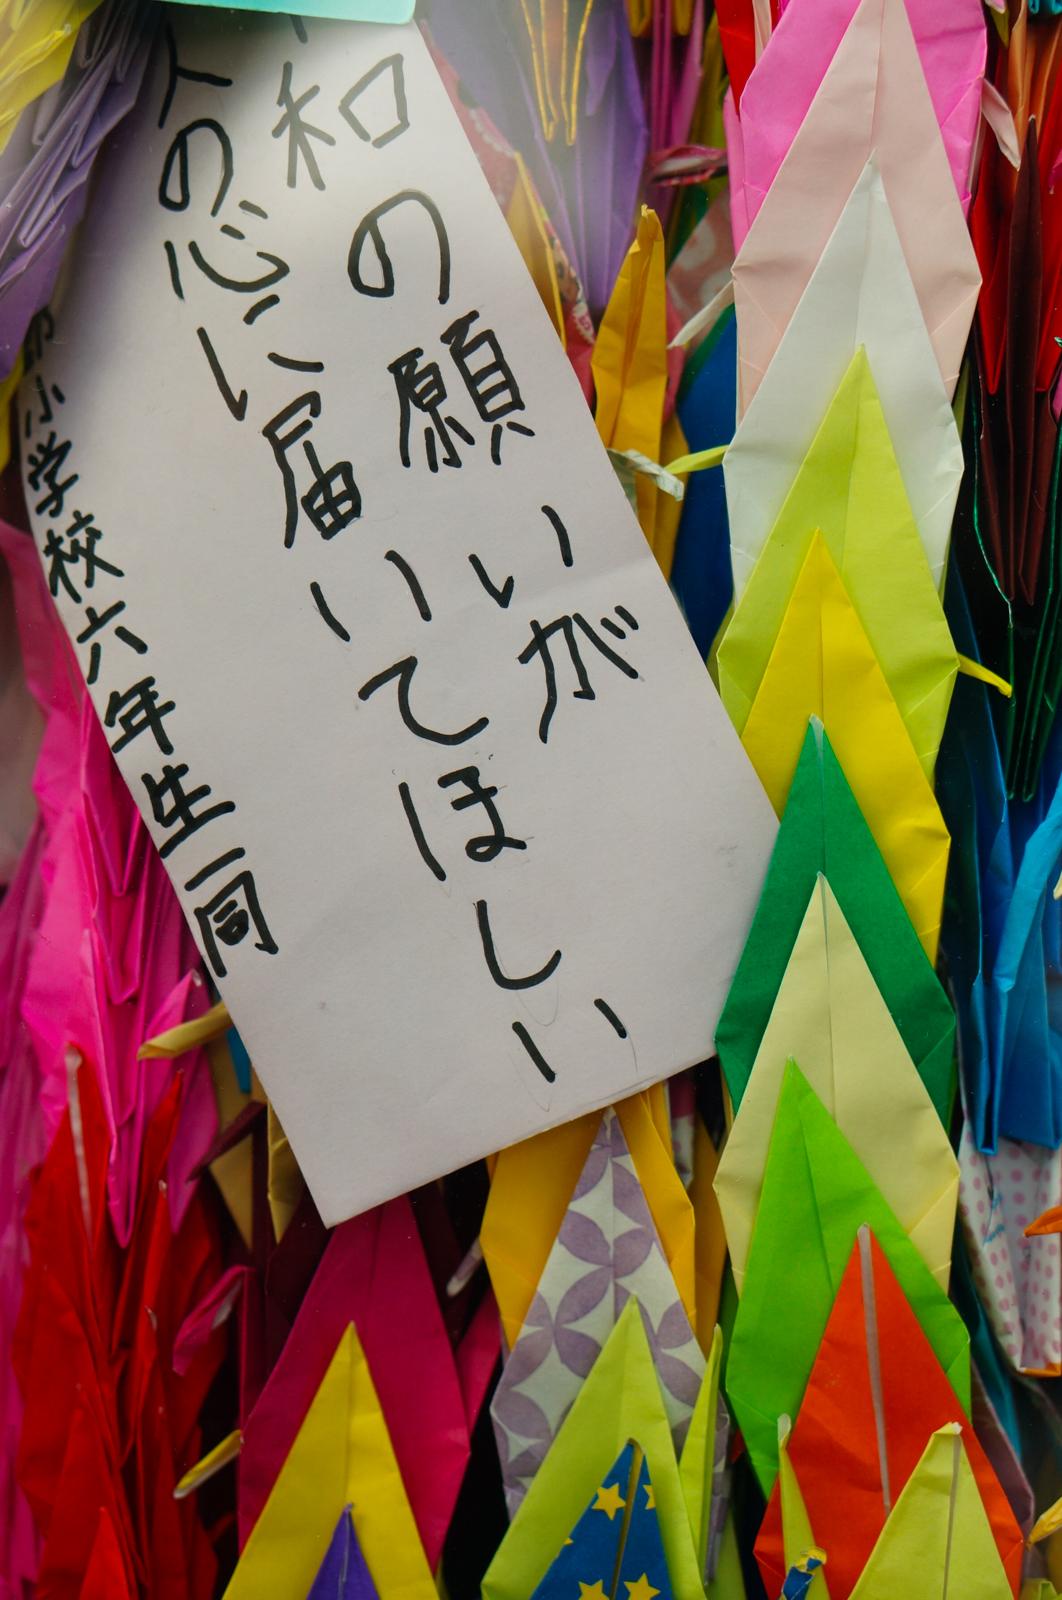 hiroshima, voyage japon, séjour japon, visiter japon, hiroshima novembre, hiroshima automne